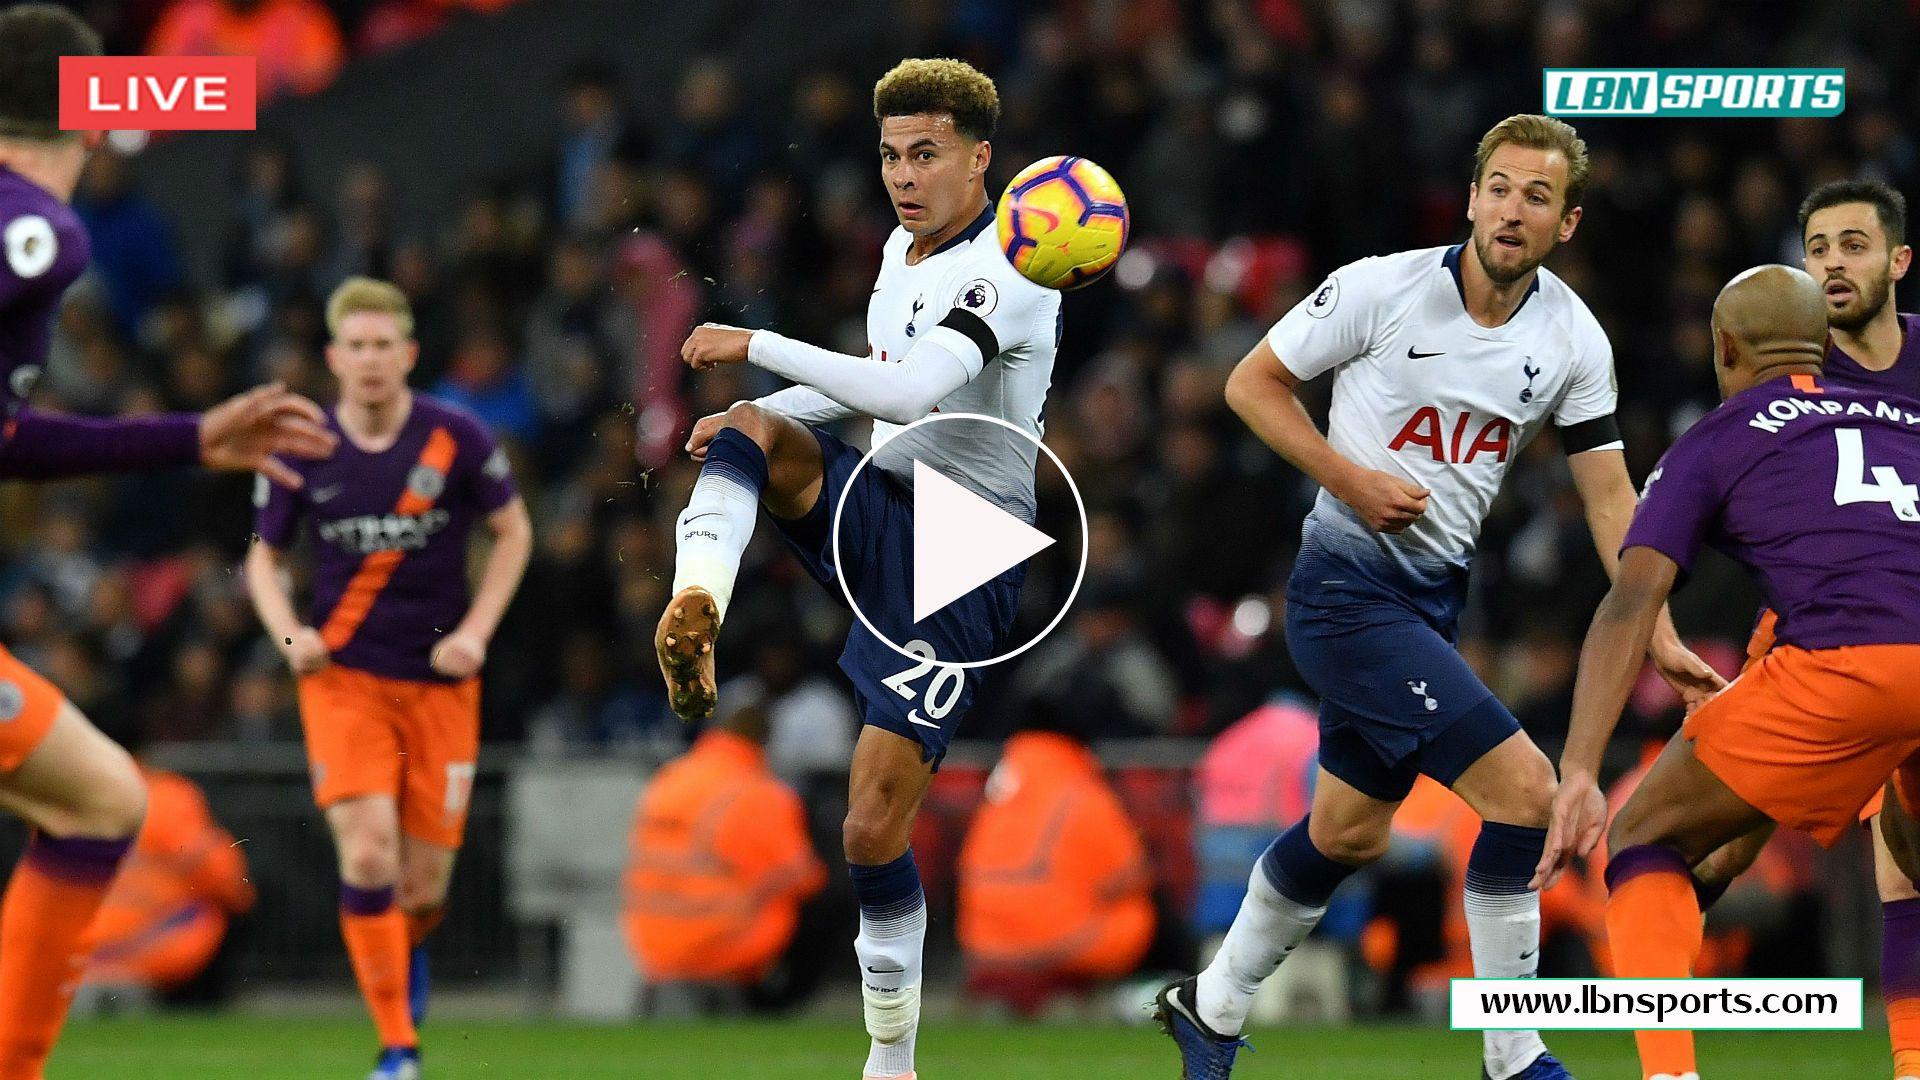 Tottenham vs Man City LIVE! Reddit Soccer Streams 9 Apr